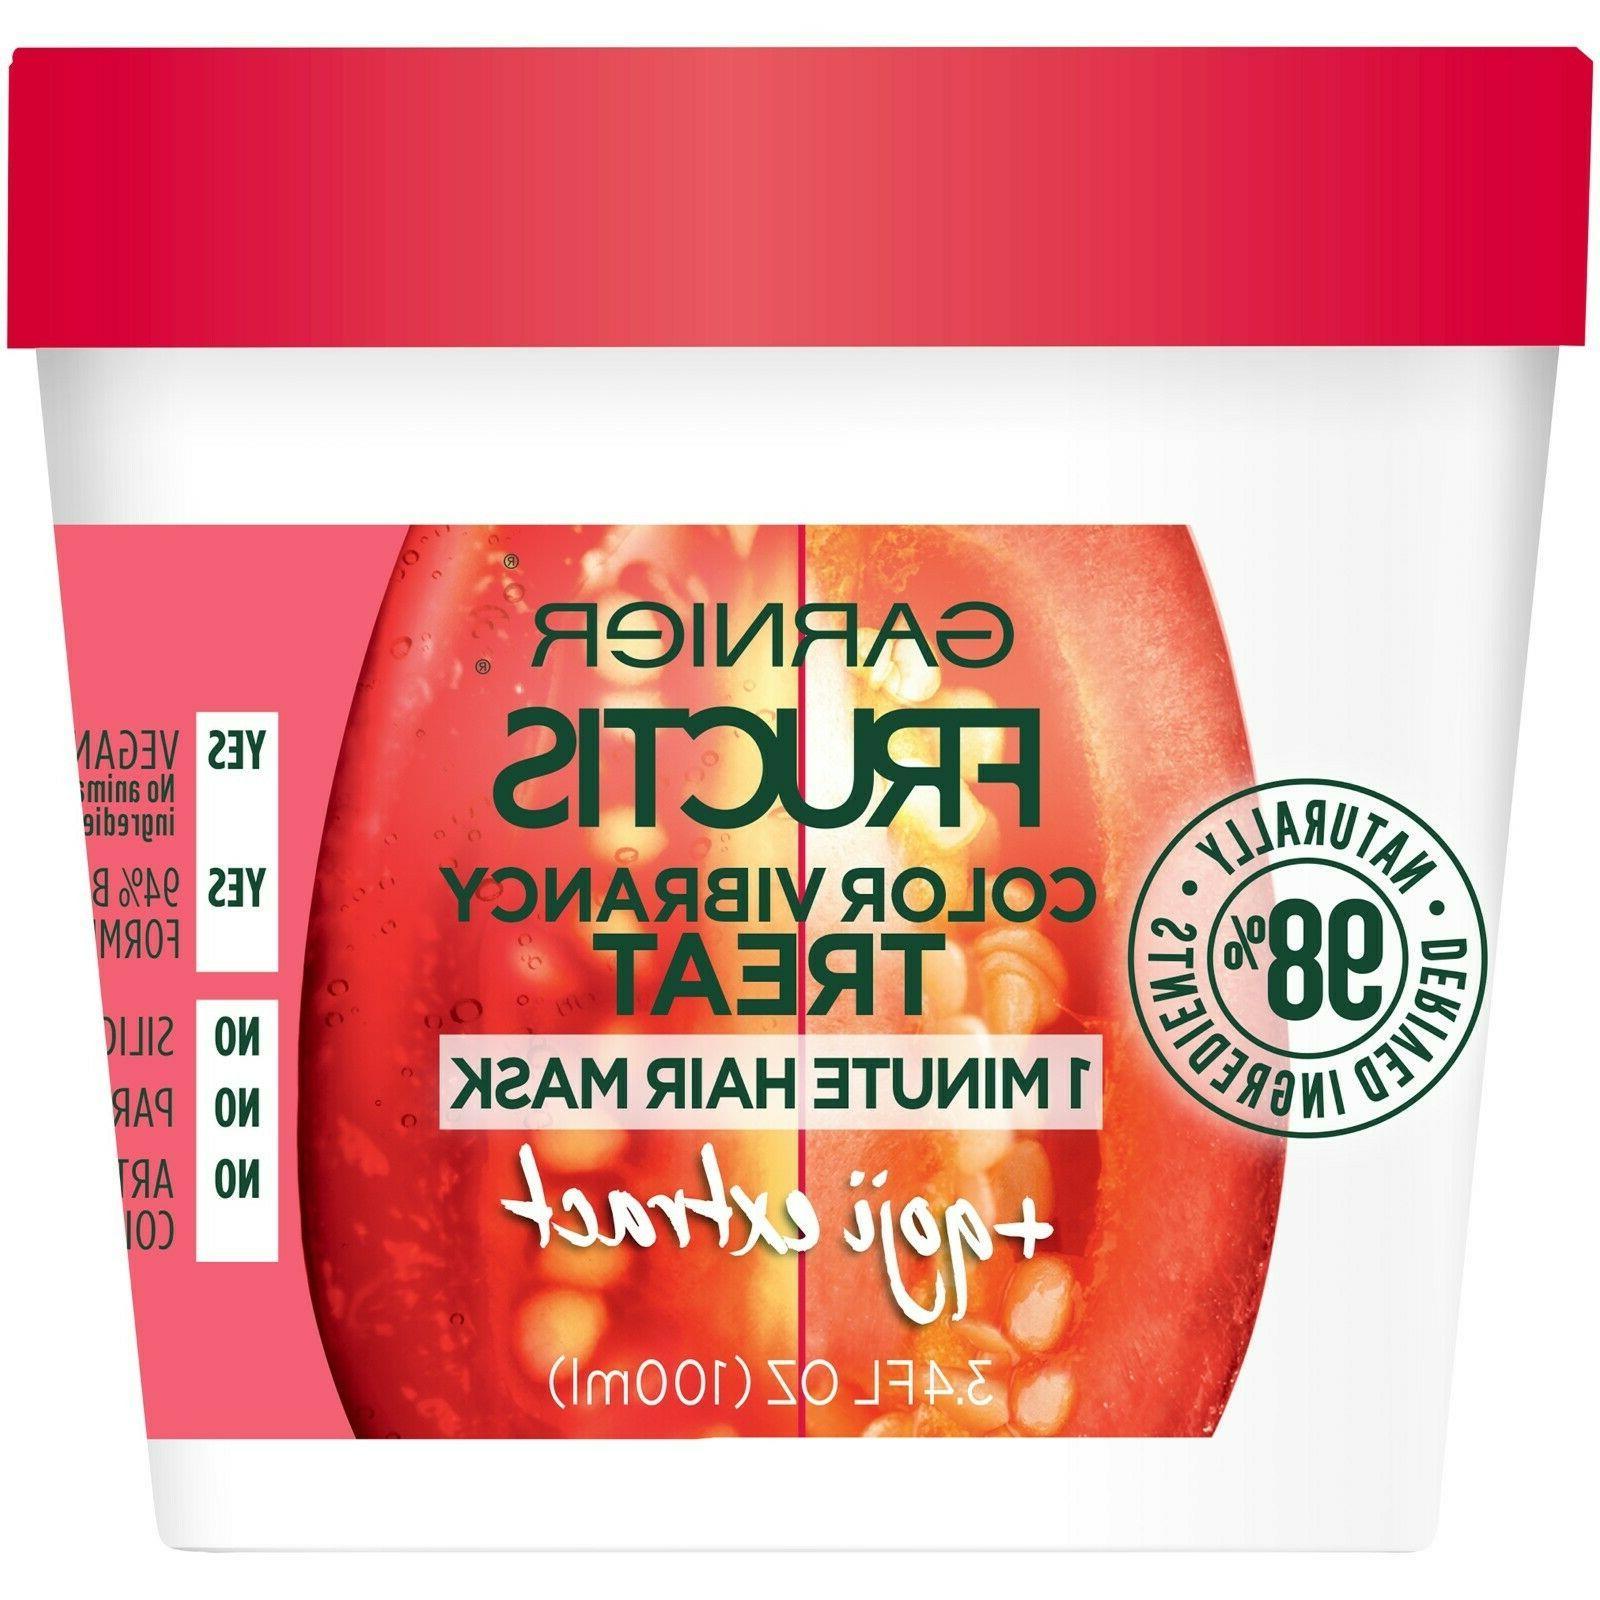 fructis vibrancy treat hair mask